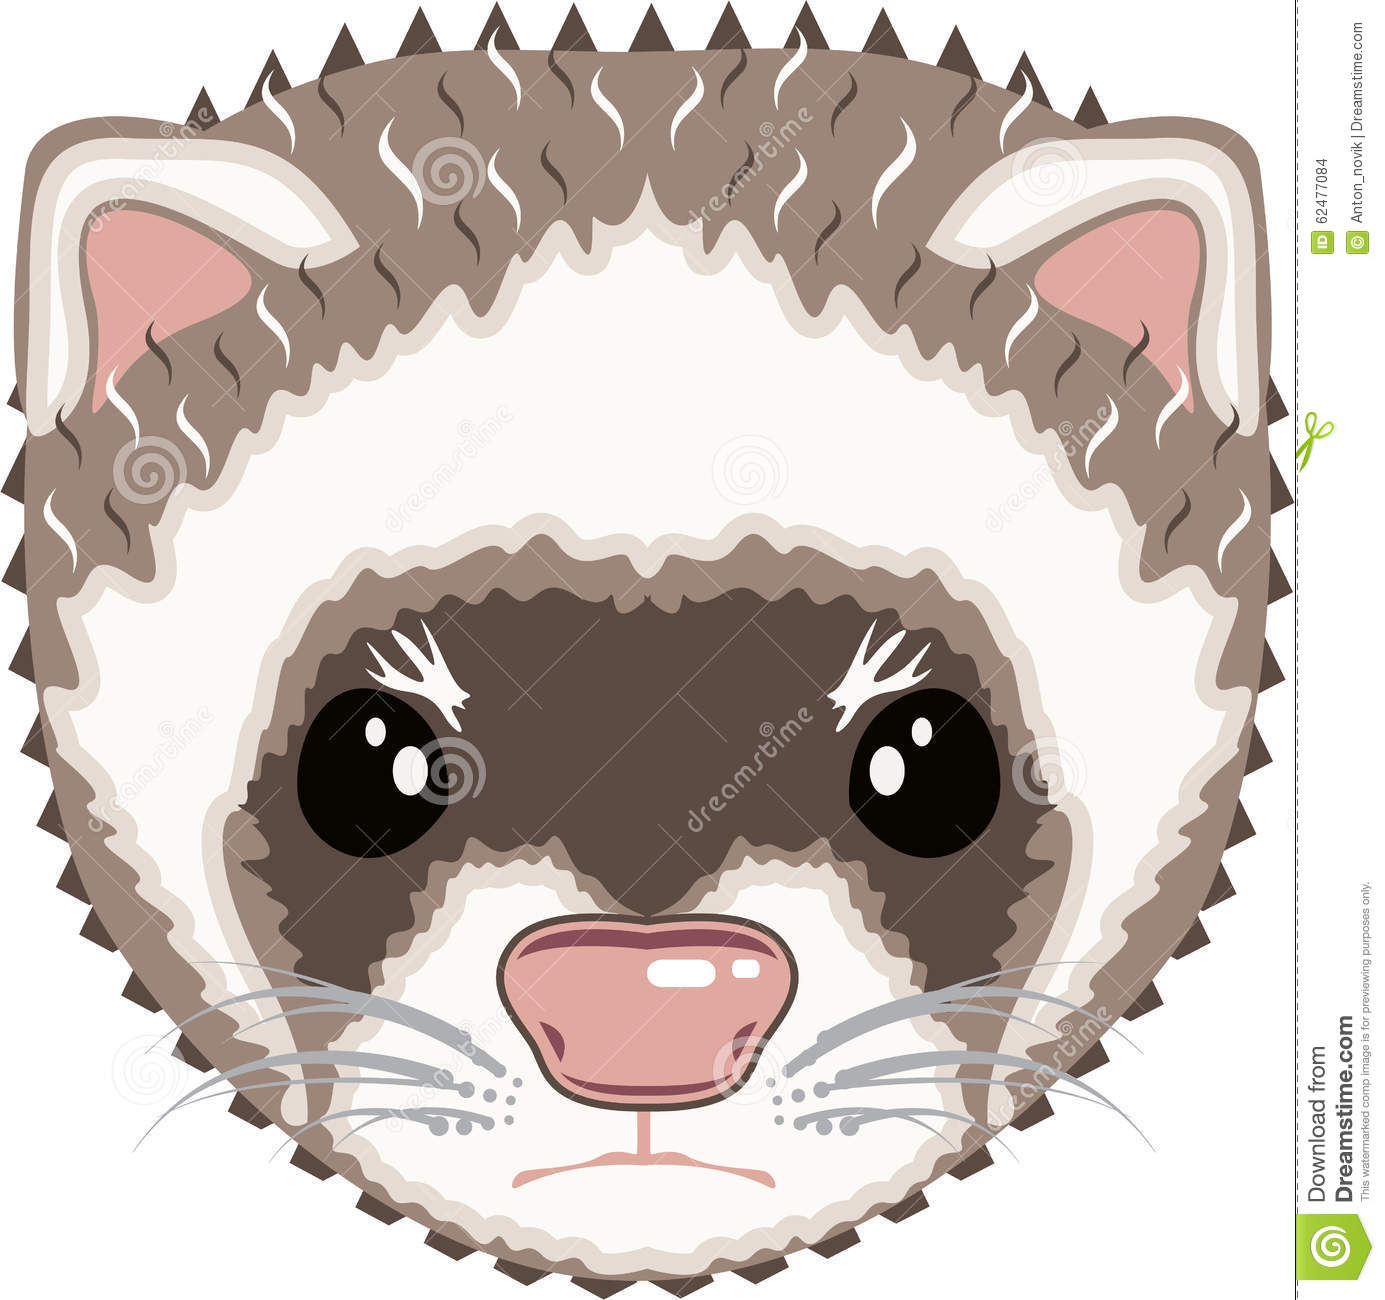 Ferret Clipart | Clipart Panda - Free Clipart Images